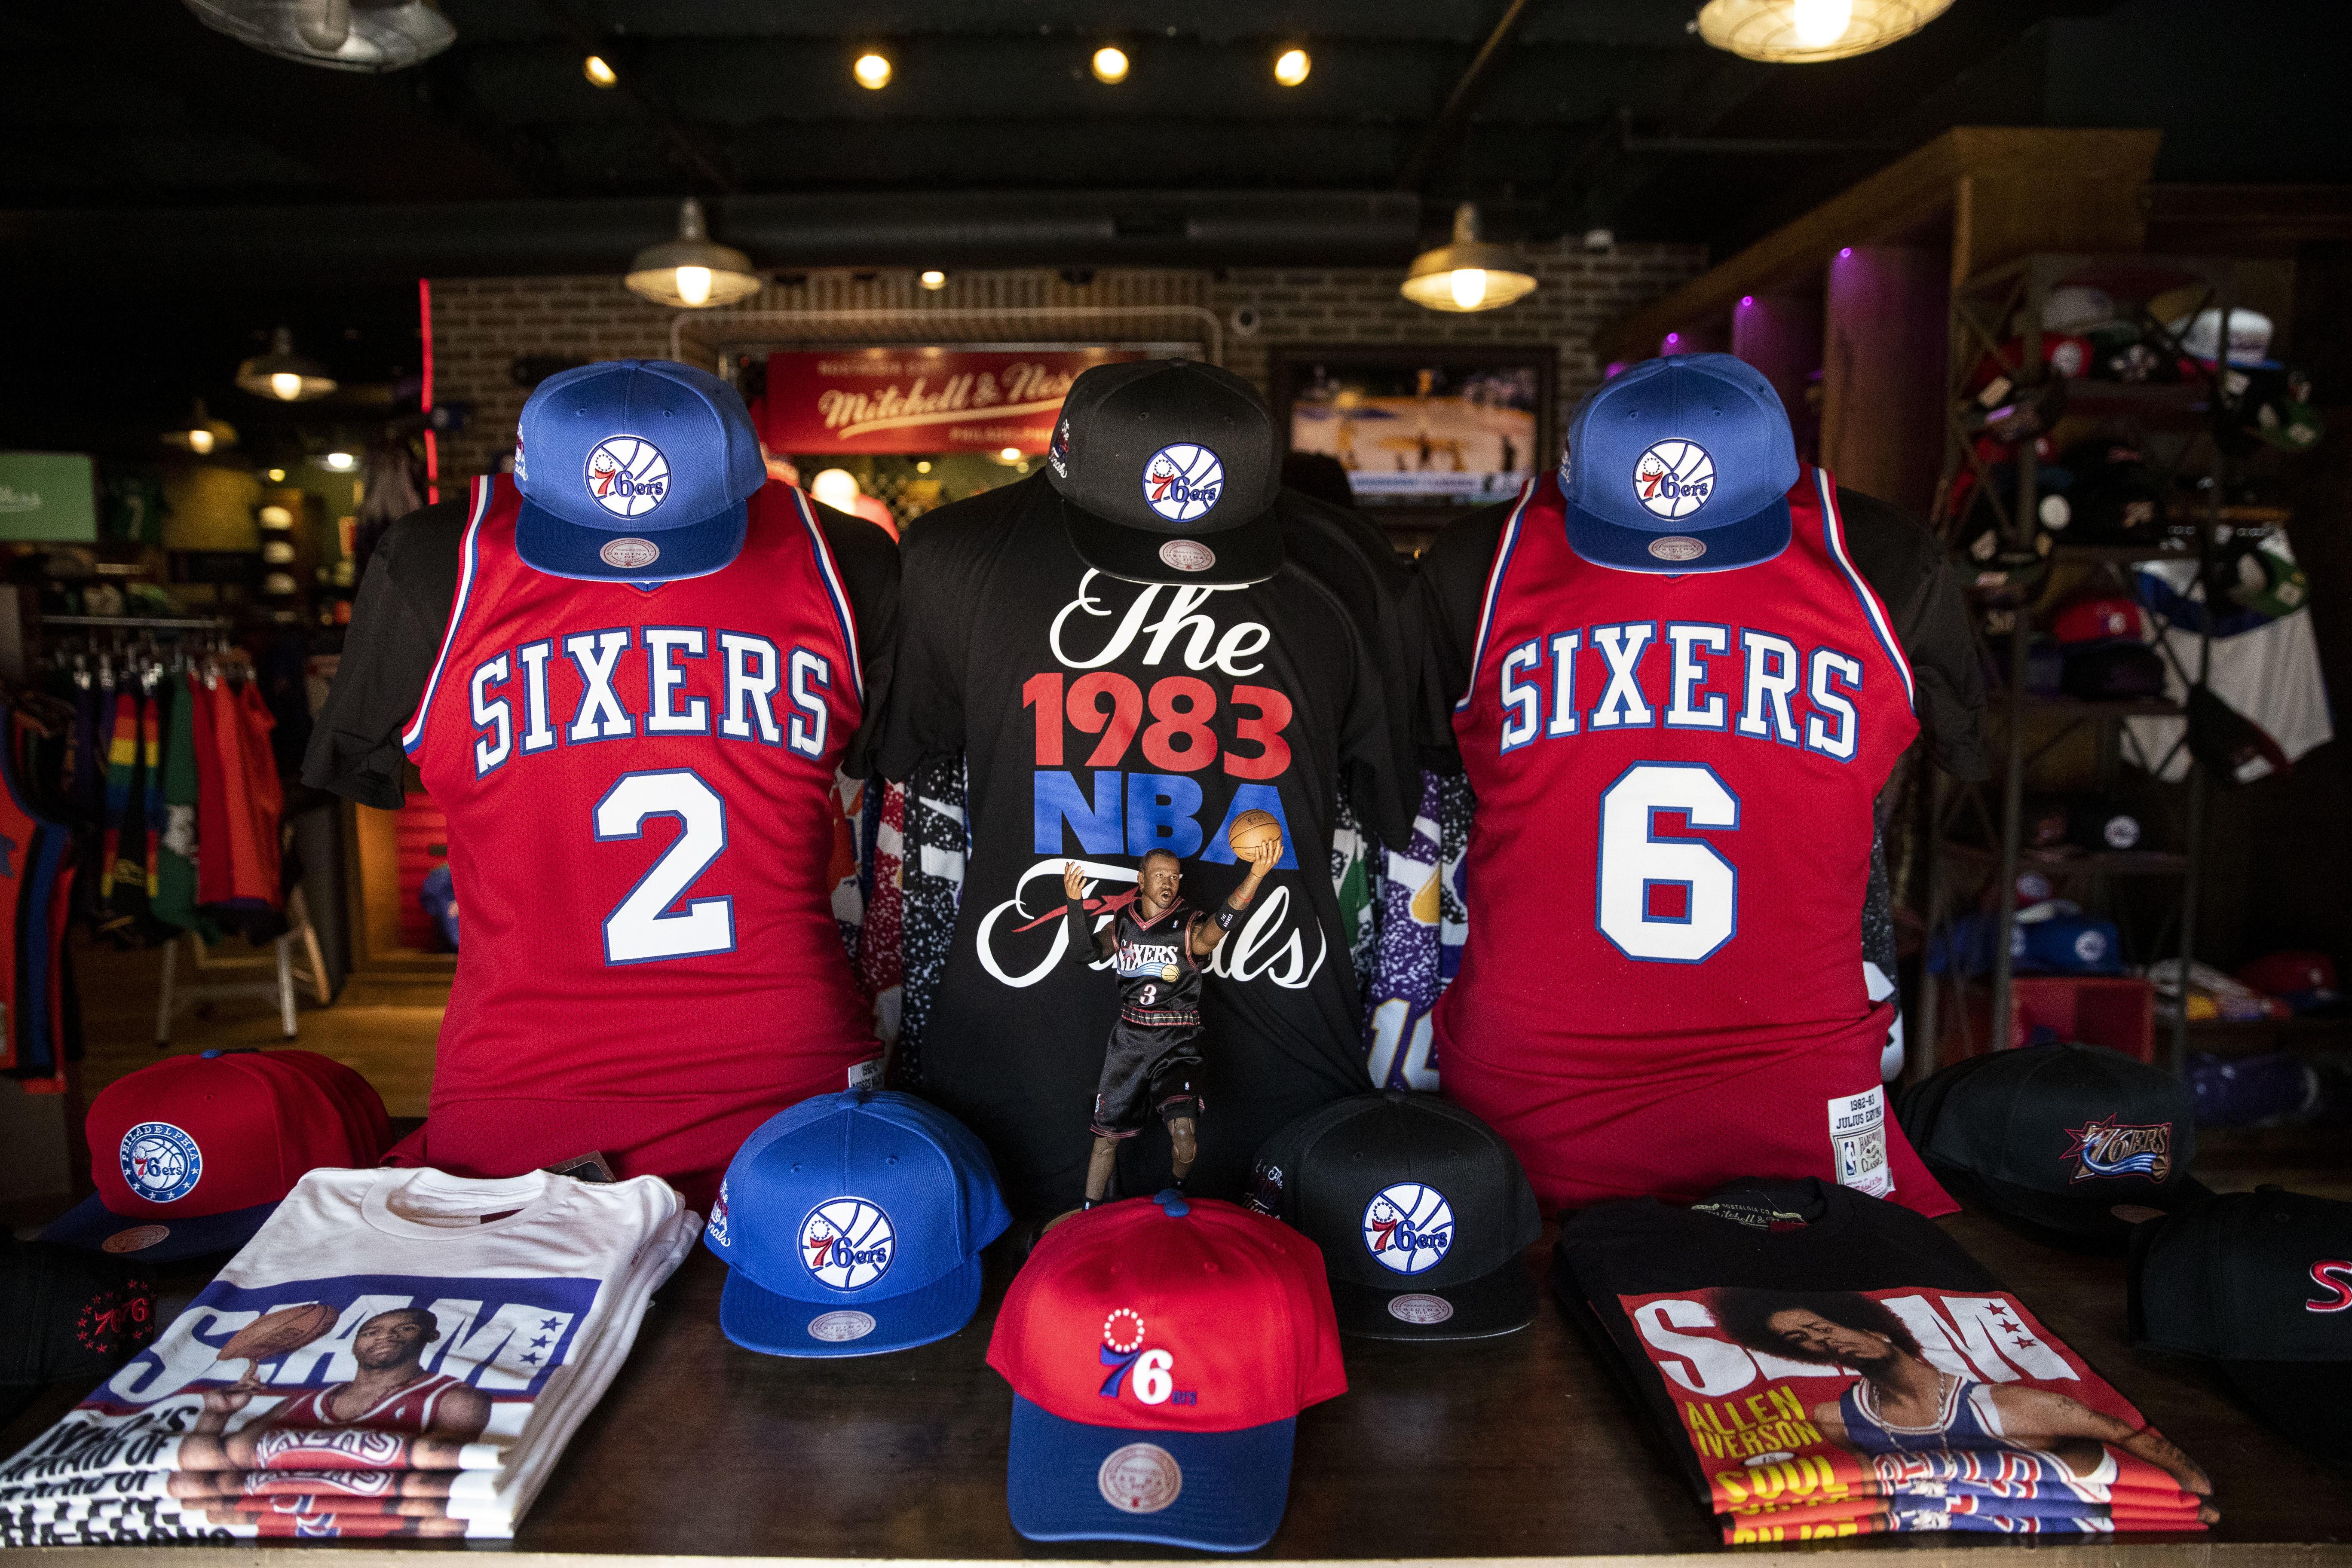 Best places to buy Sixers gear in Philadelphia